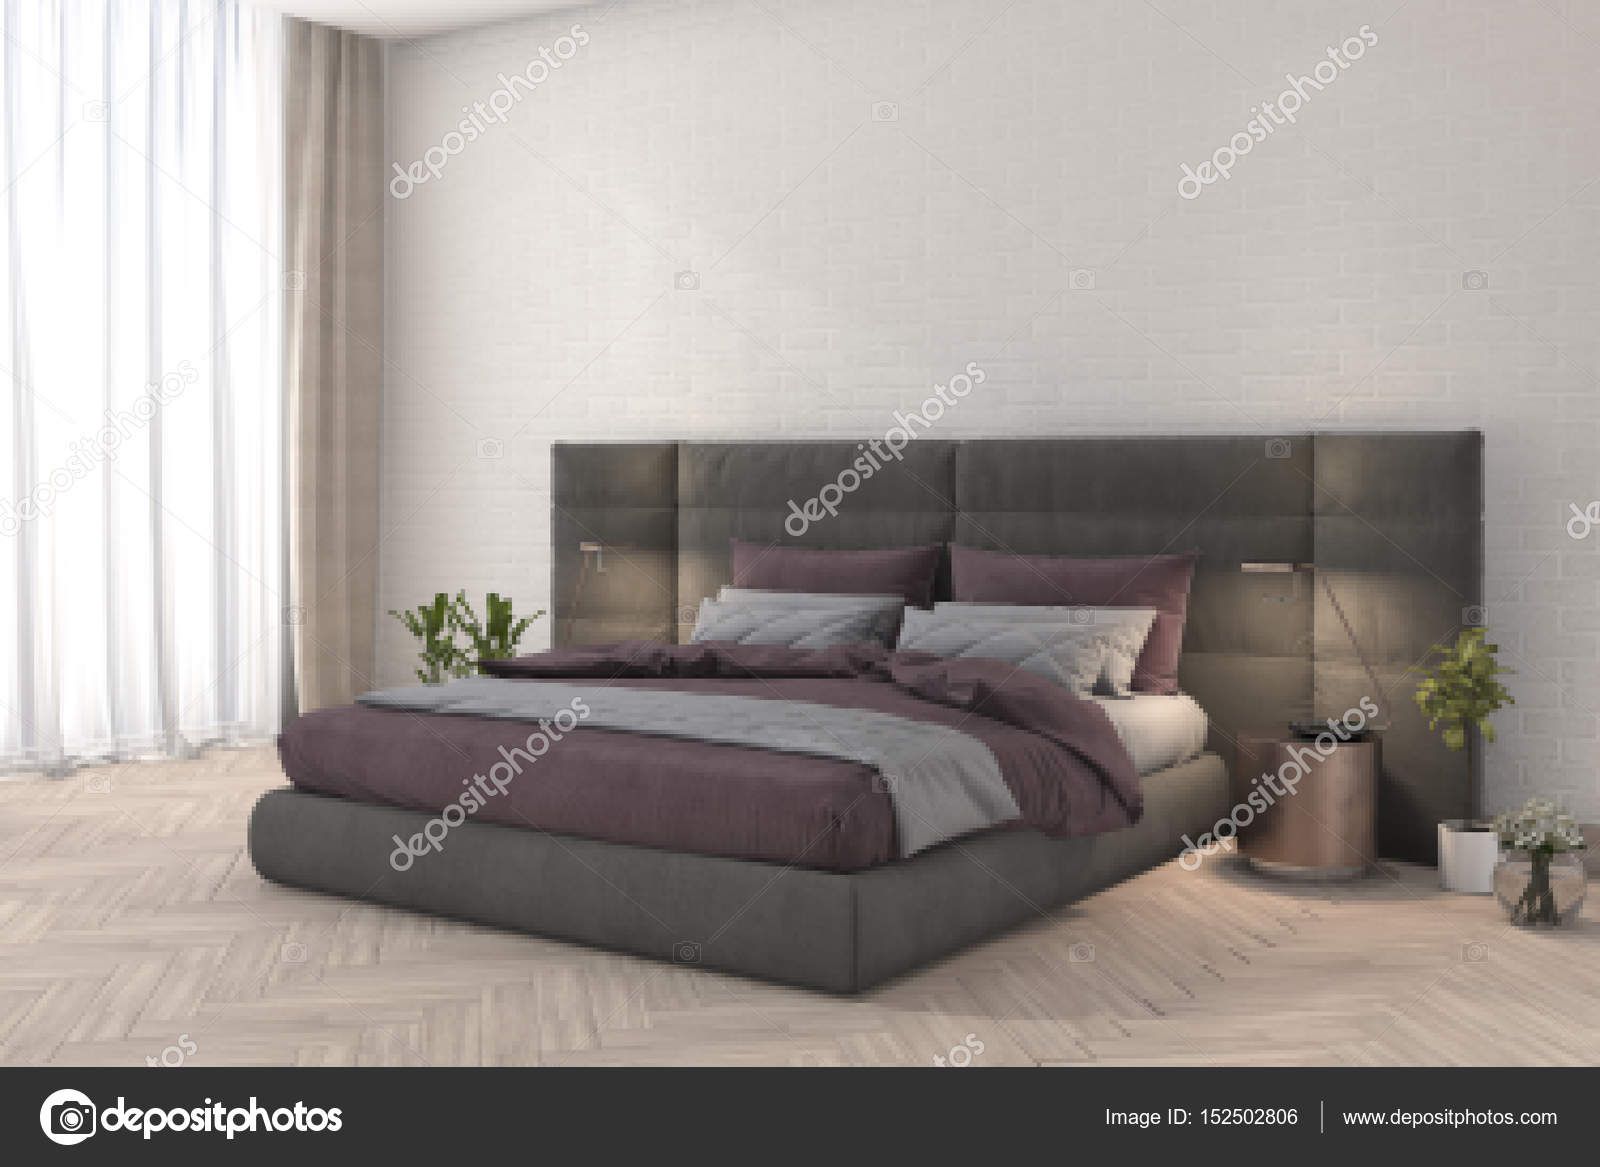 Roze Slaapkamer Lamp : D rendering roze stof slaapkamer met lamp en minimale decor